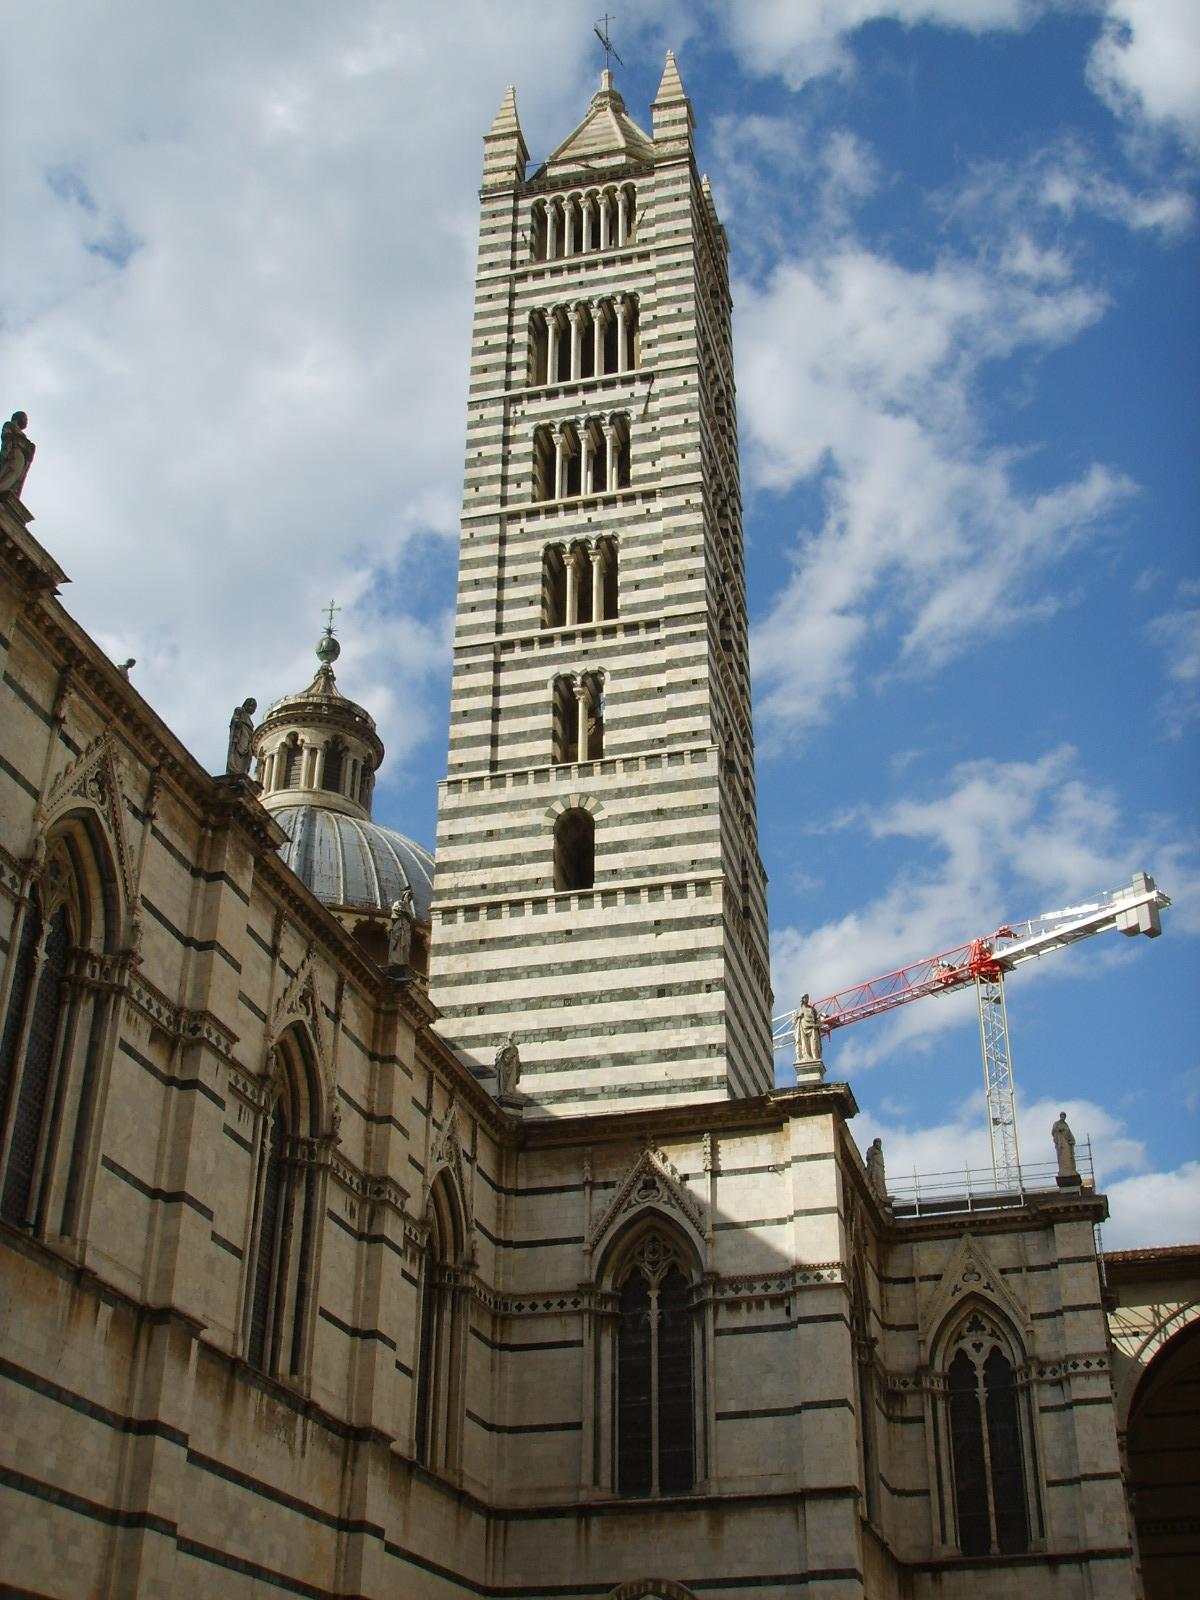 File:Cattedrale di Siena, campanile.JPG - Wikimedia Commons